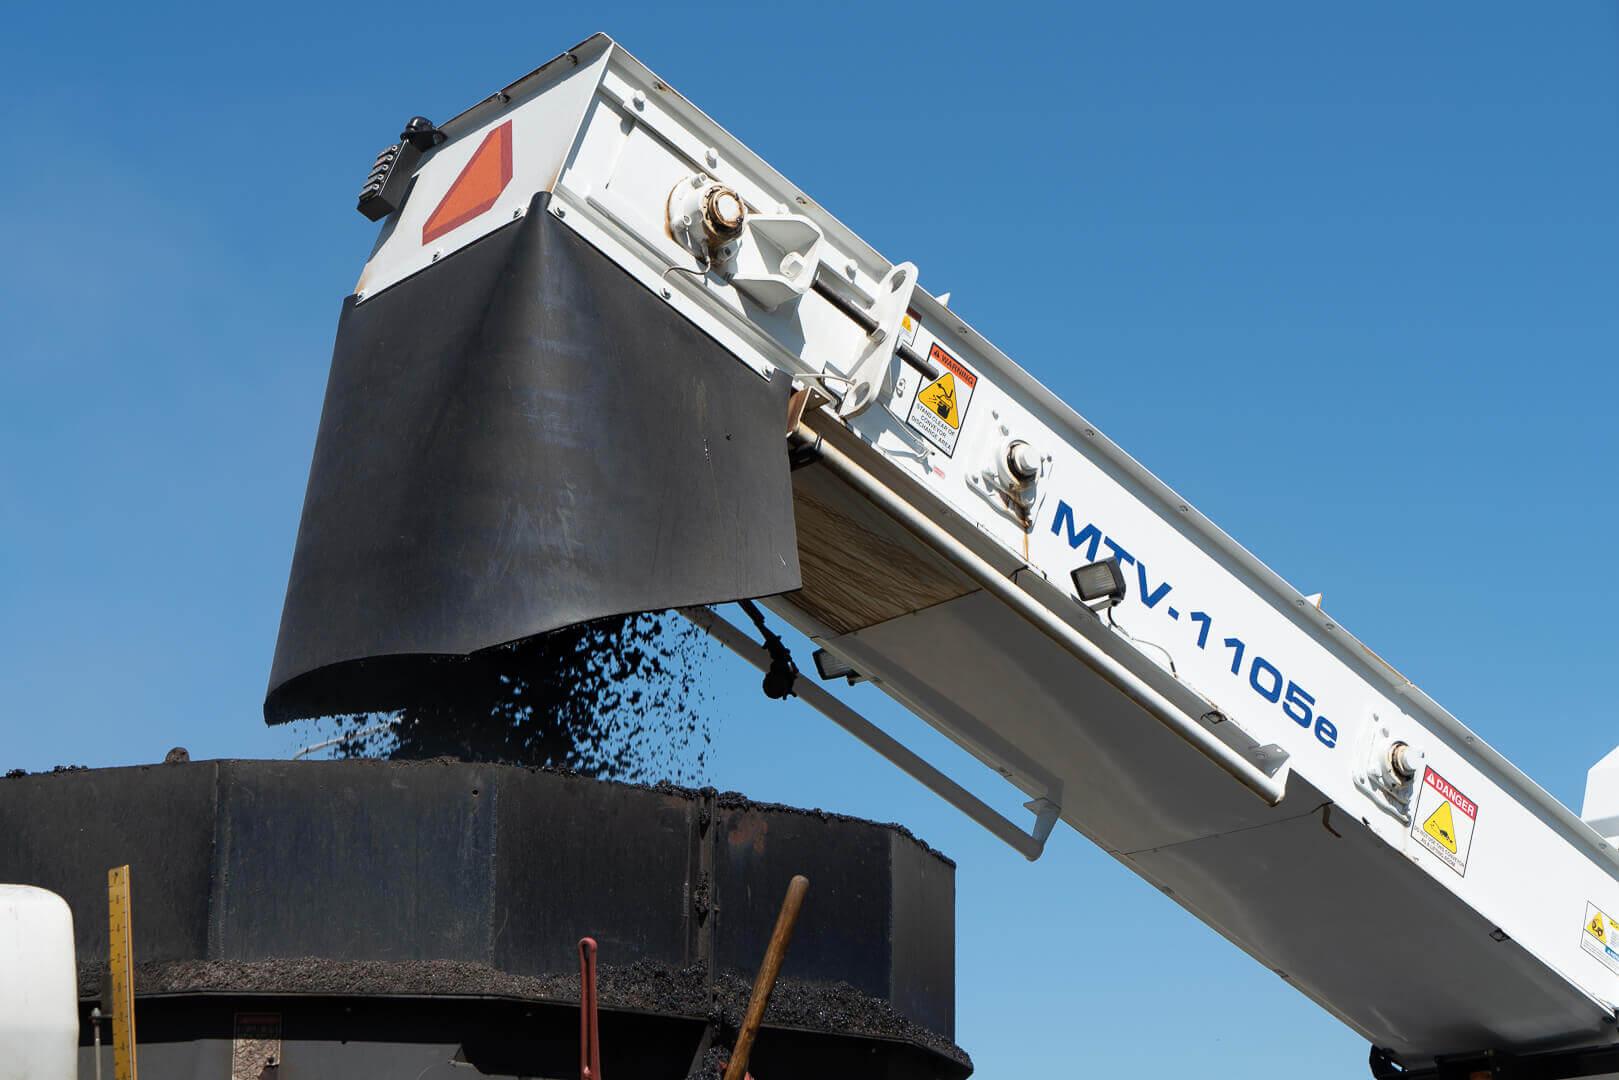 Roadtec MTV-1105 Material Transfer Vehicle Conveyor Dumping Material into Paver Hopper insert